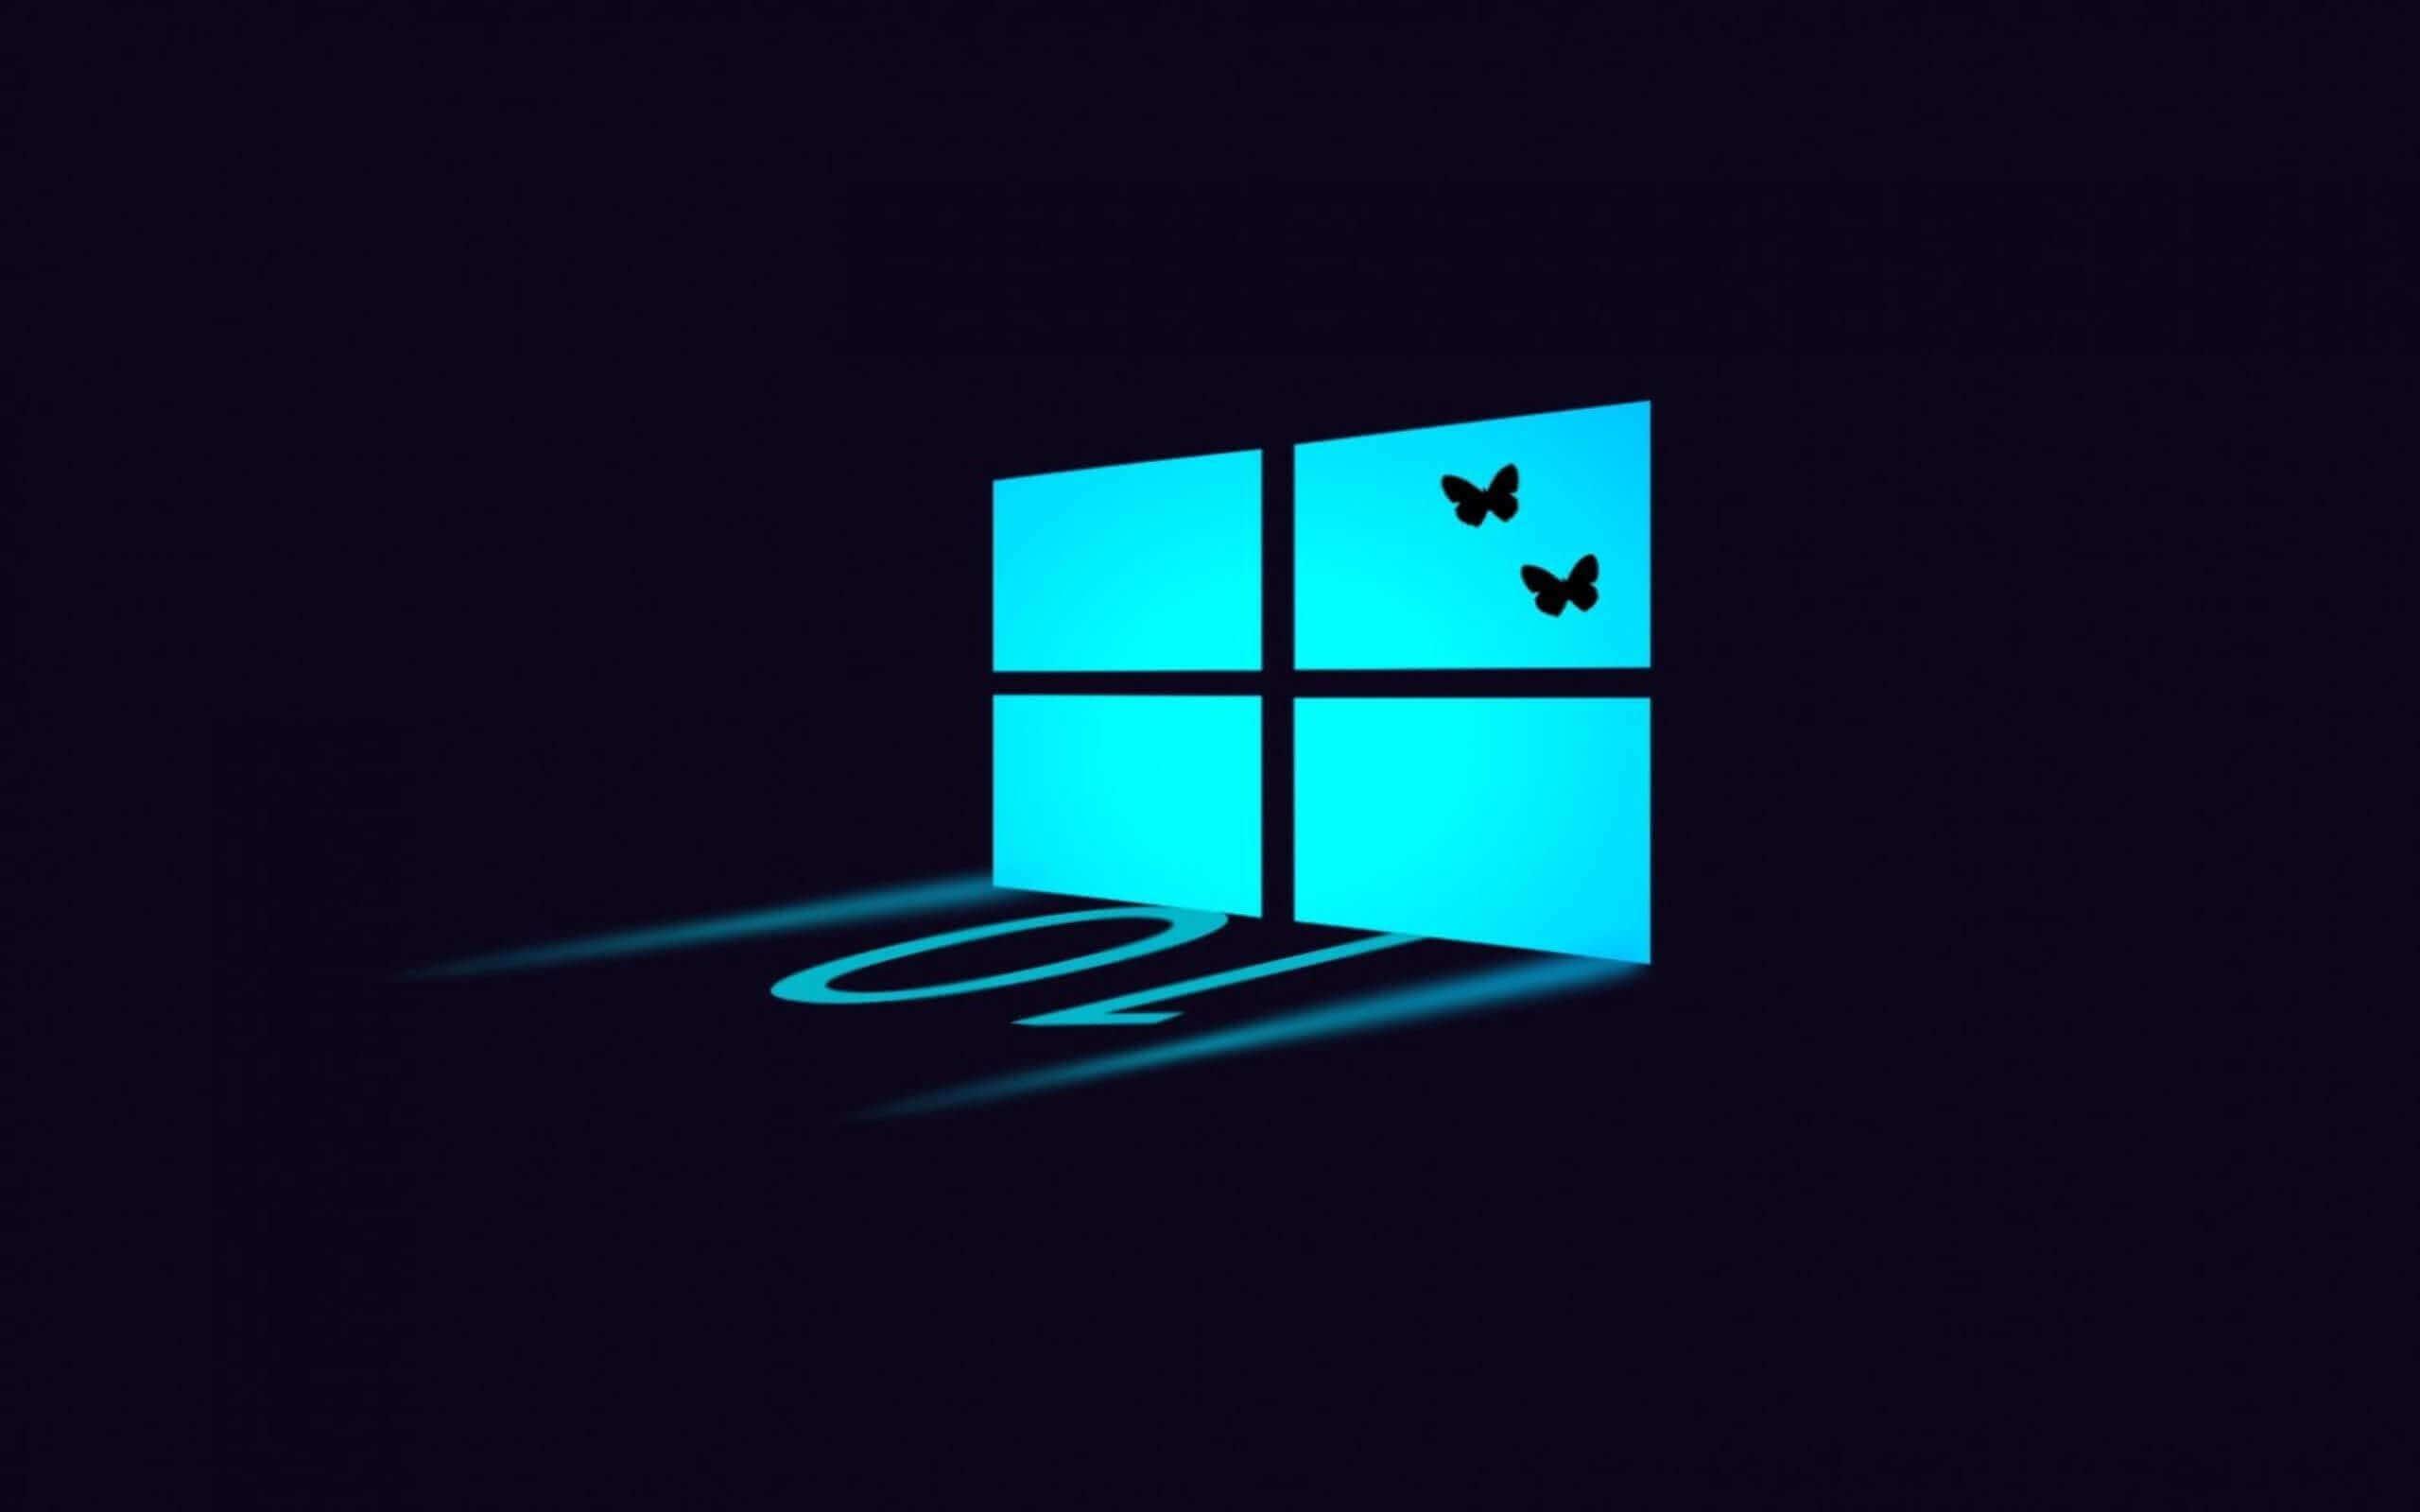 Windows 10 Phone wallpaper